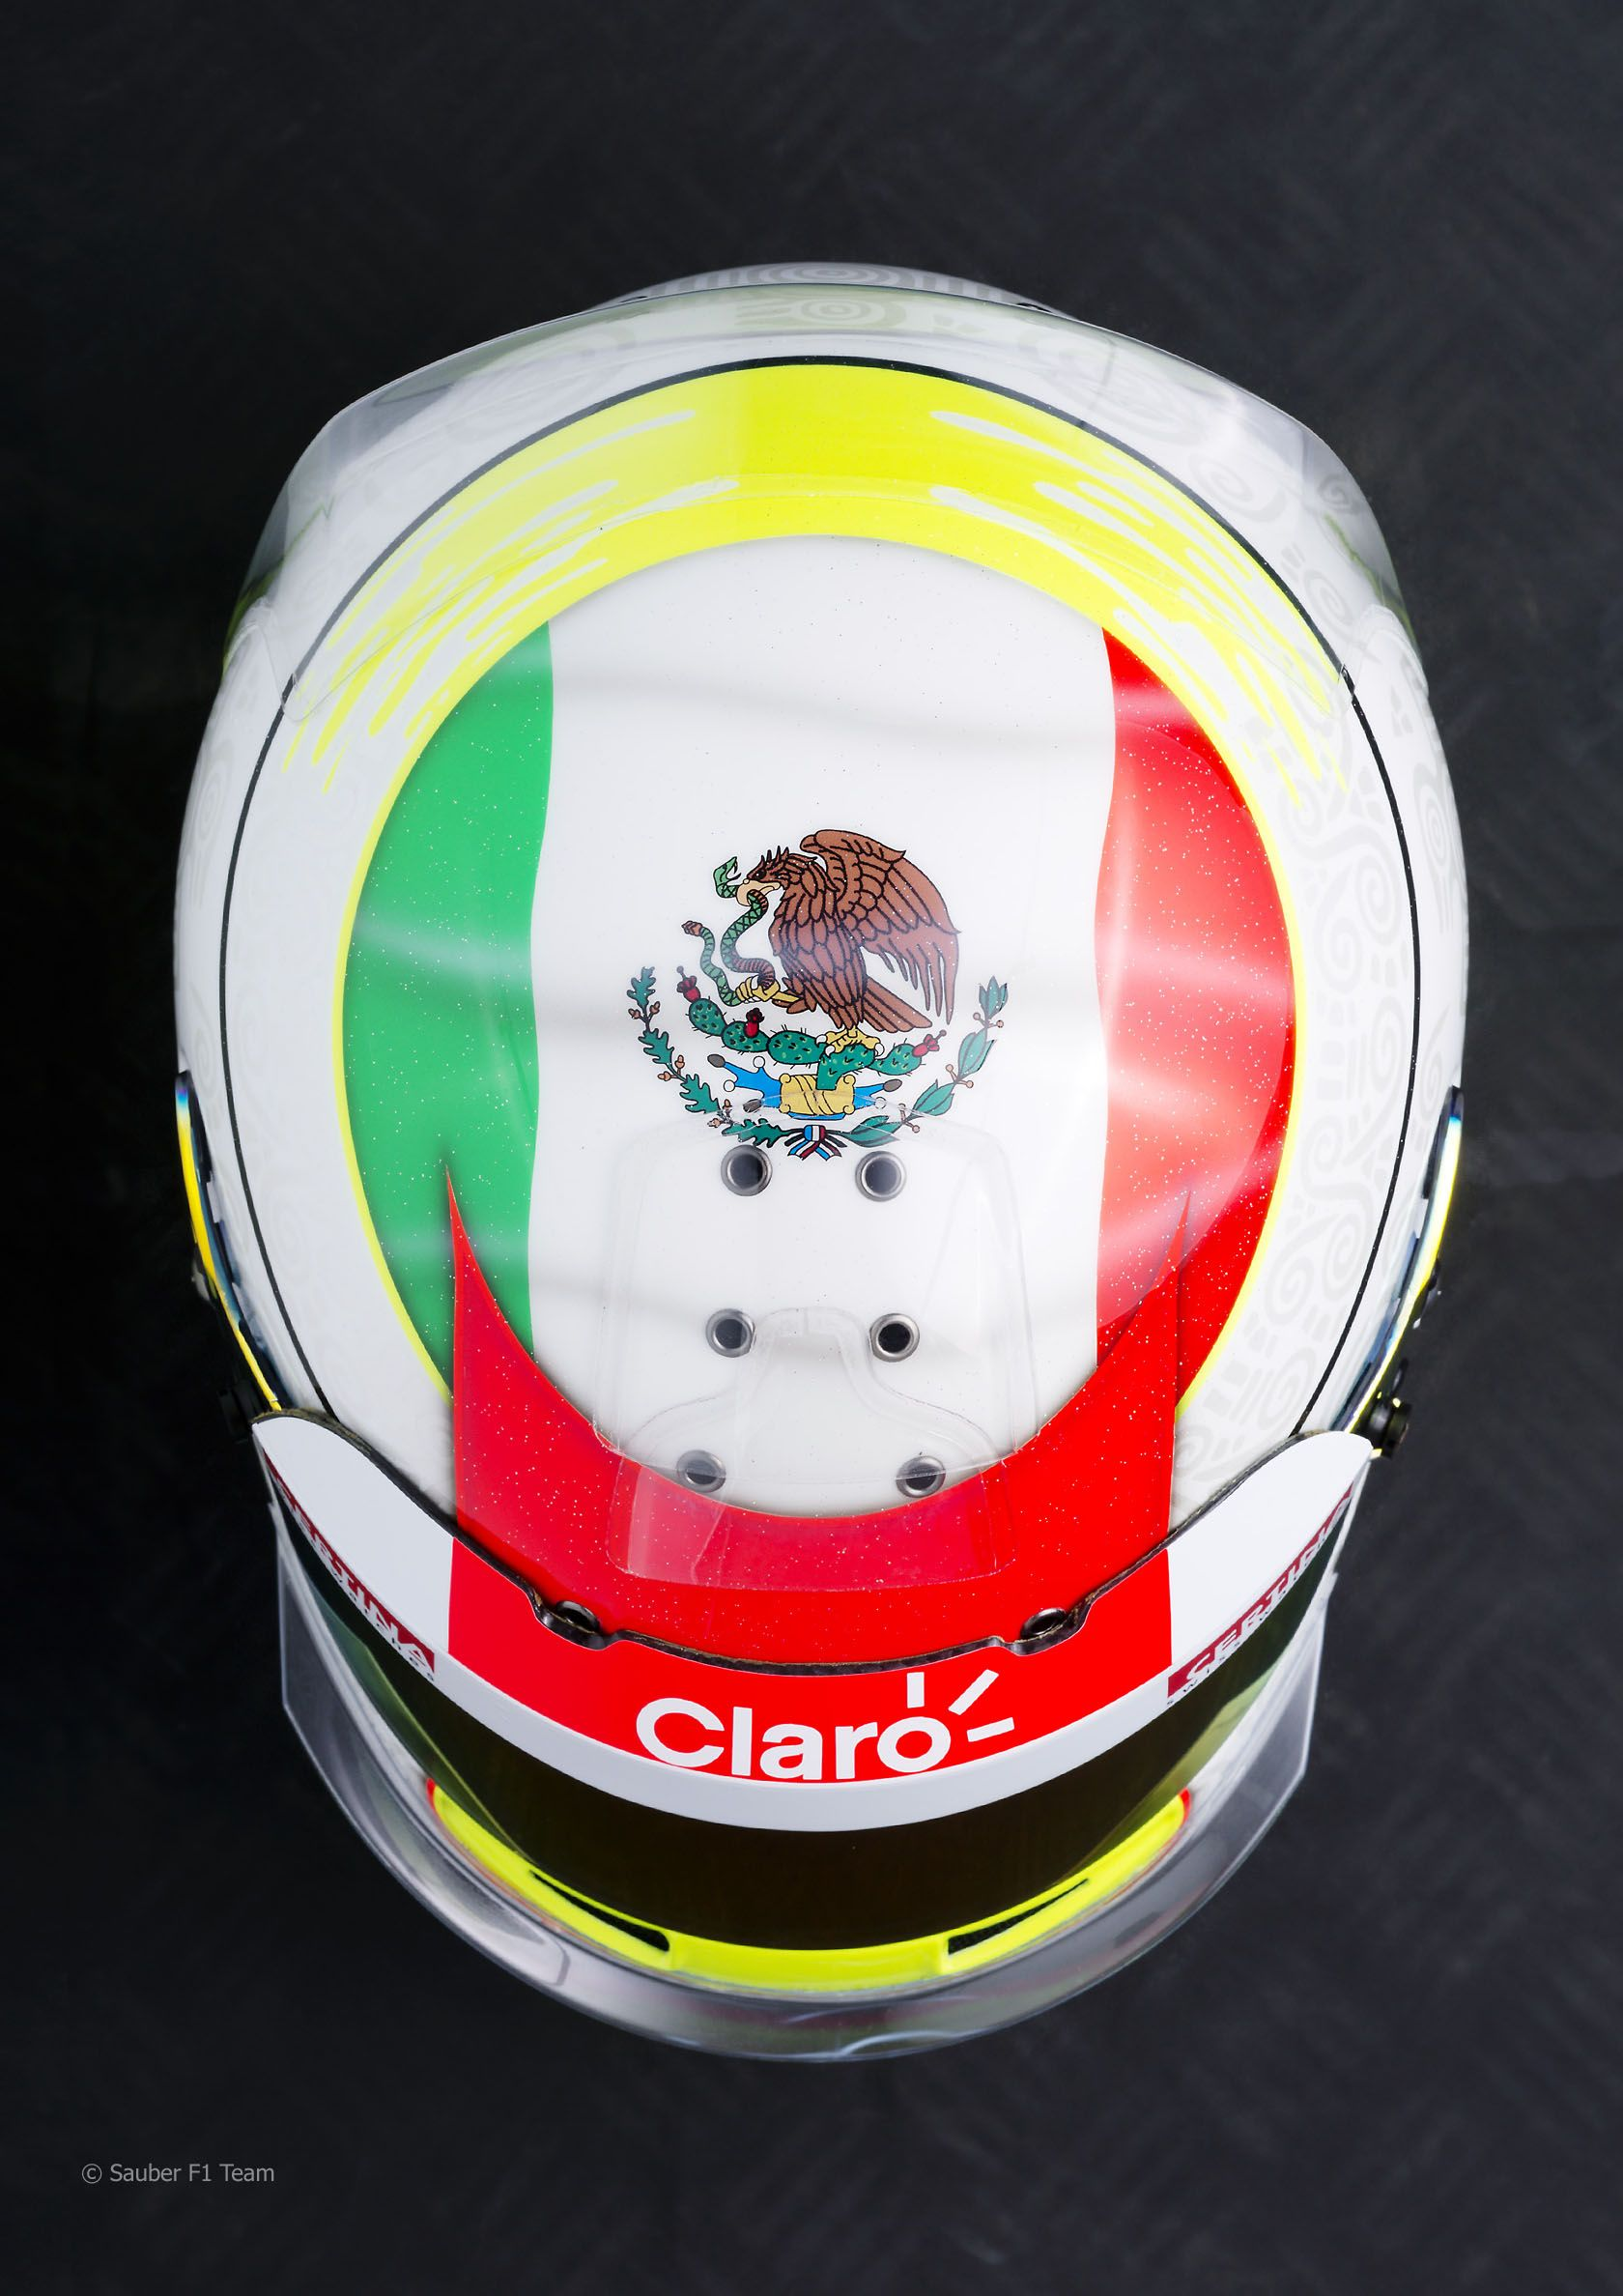 Sergio Perez helmet, Sauber, 2012 Sergio perez, Helmet